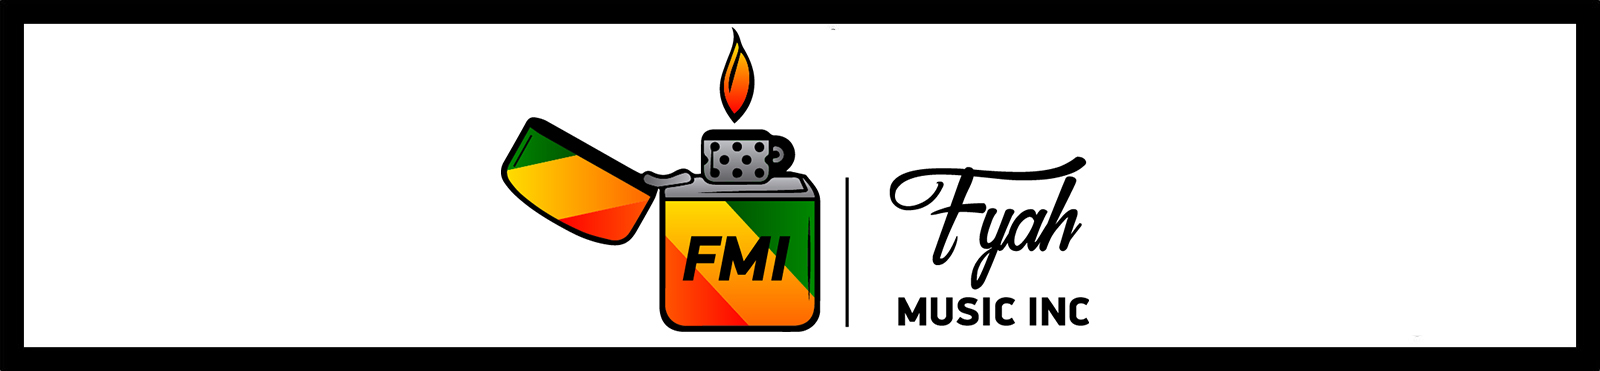 FYAH MUSIC INC